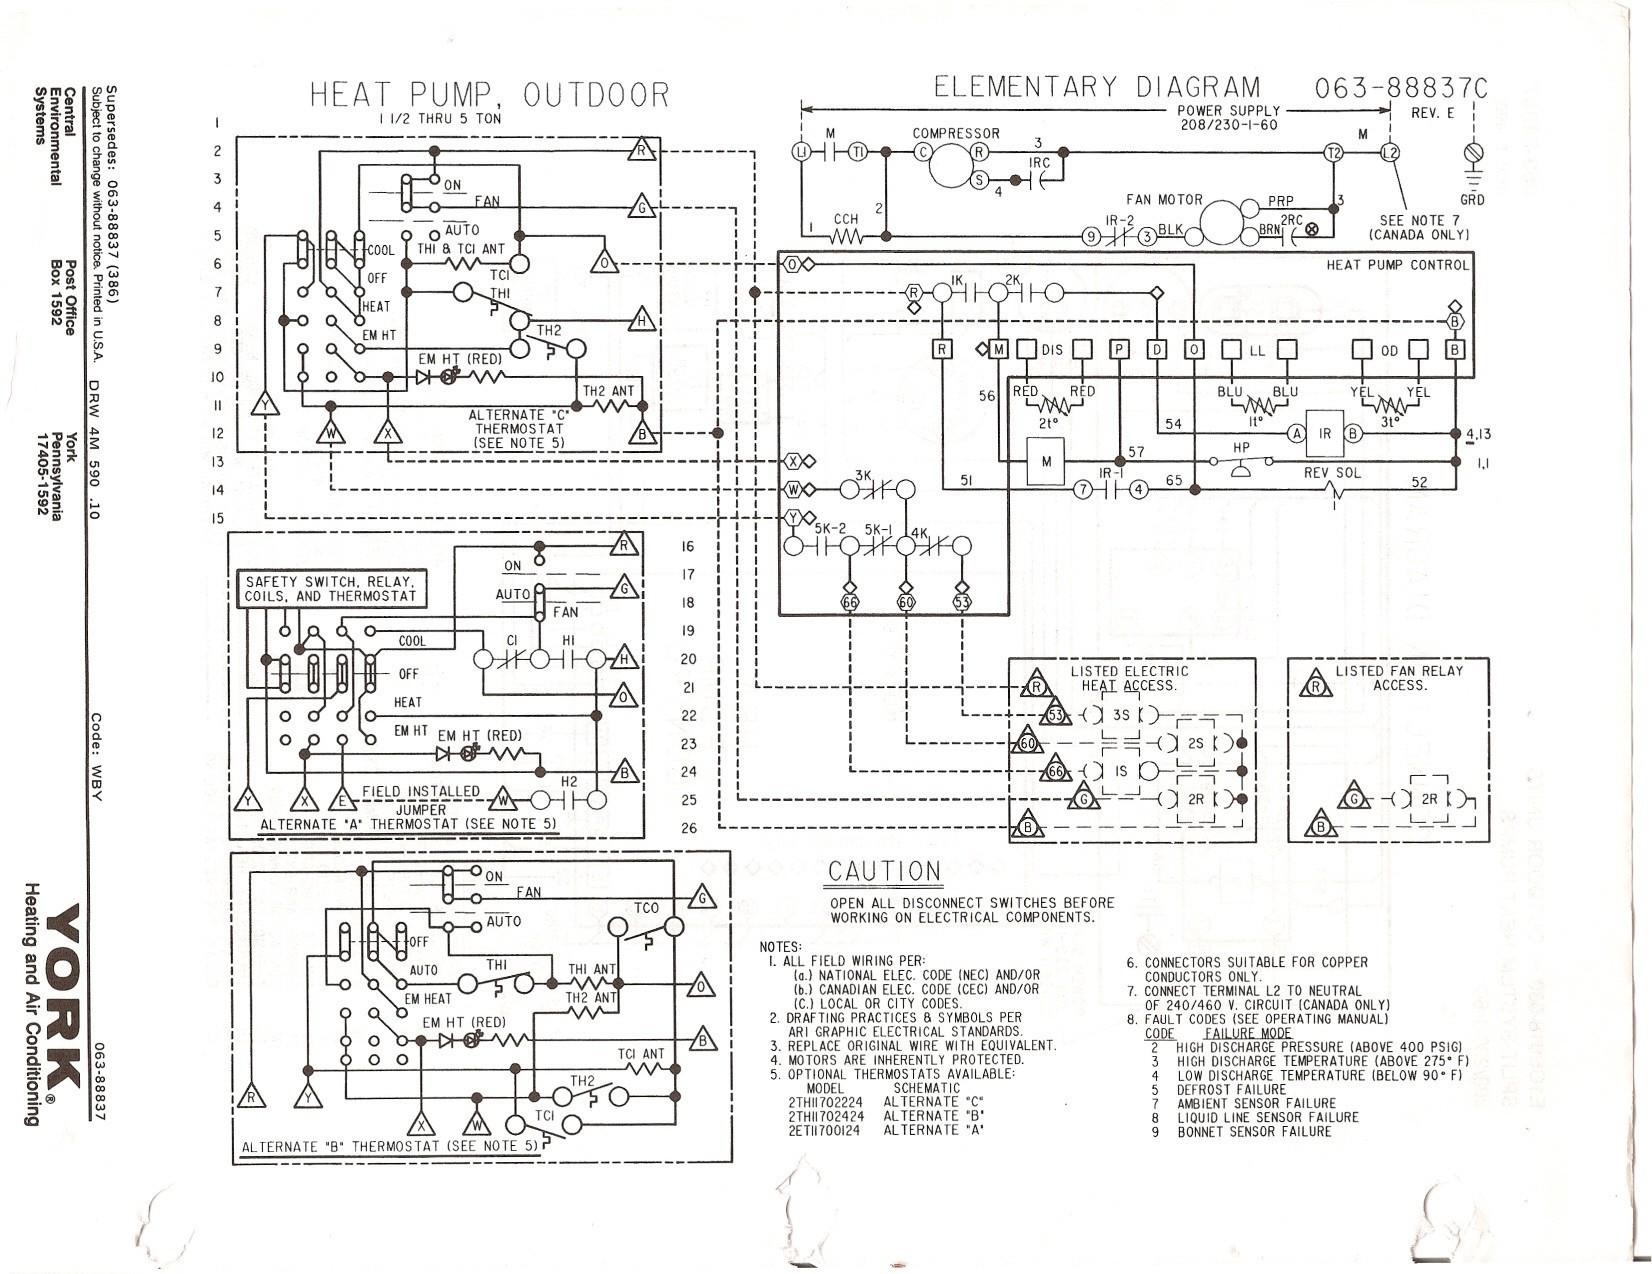 Trane Xl1400 Heat Pump | Bindu Bhatia Astrology on